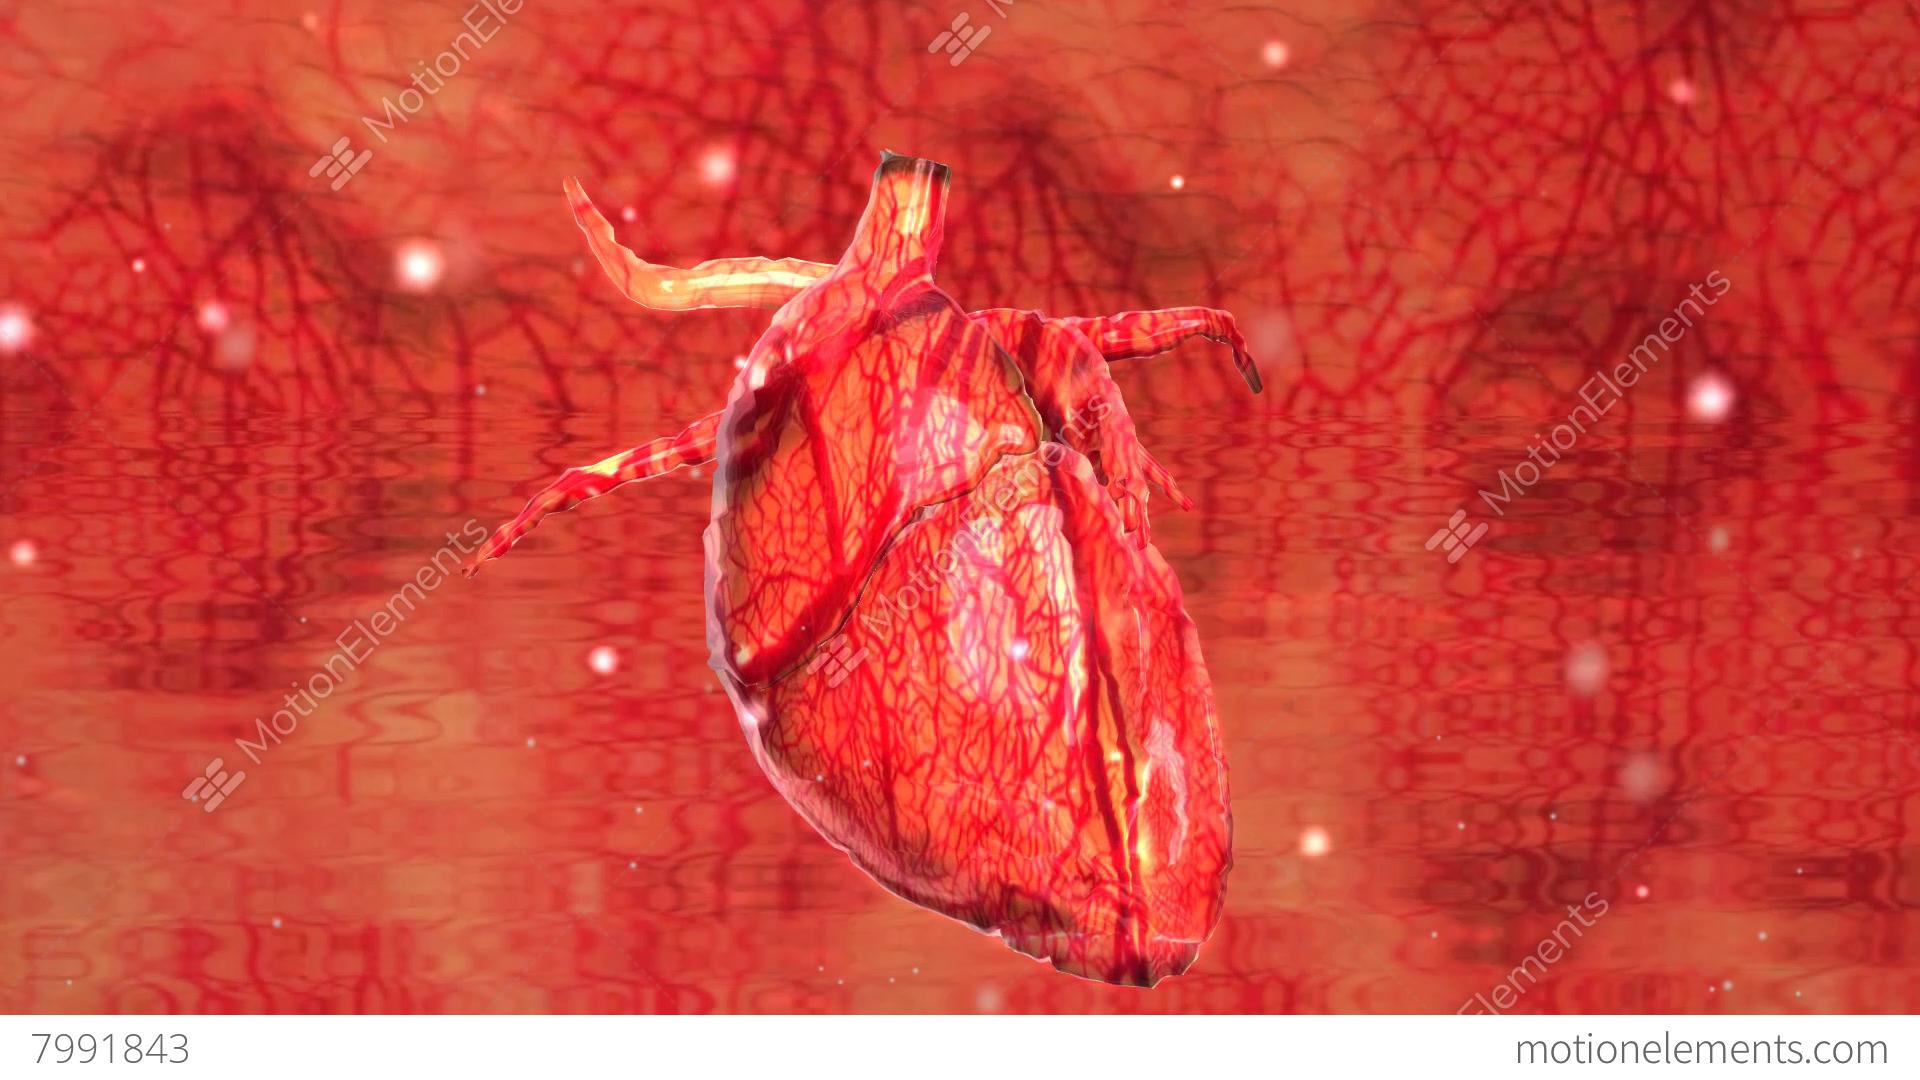 Human Heart Cardiovasculer Speed Up Beating Animation Stock video ...